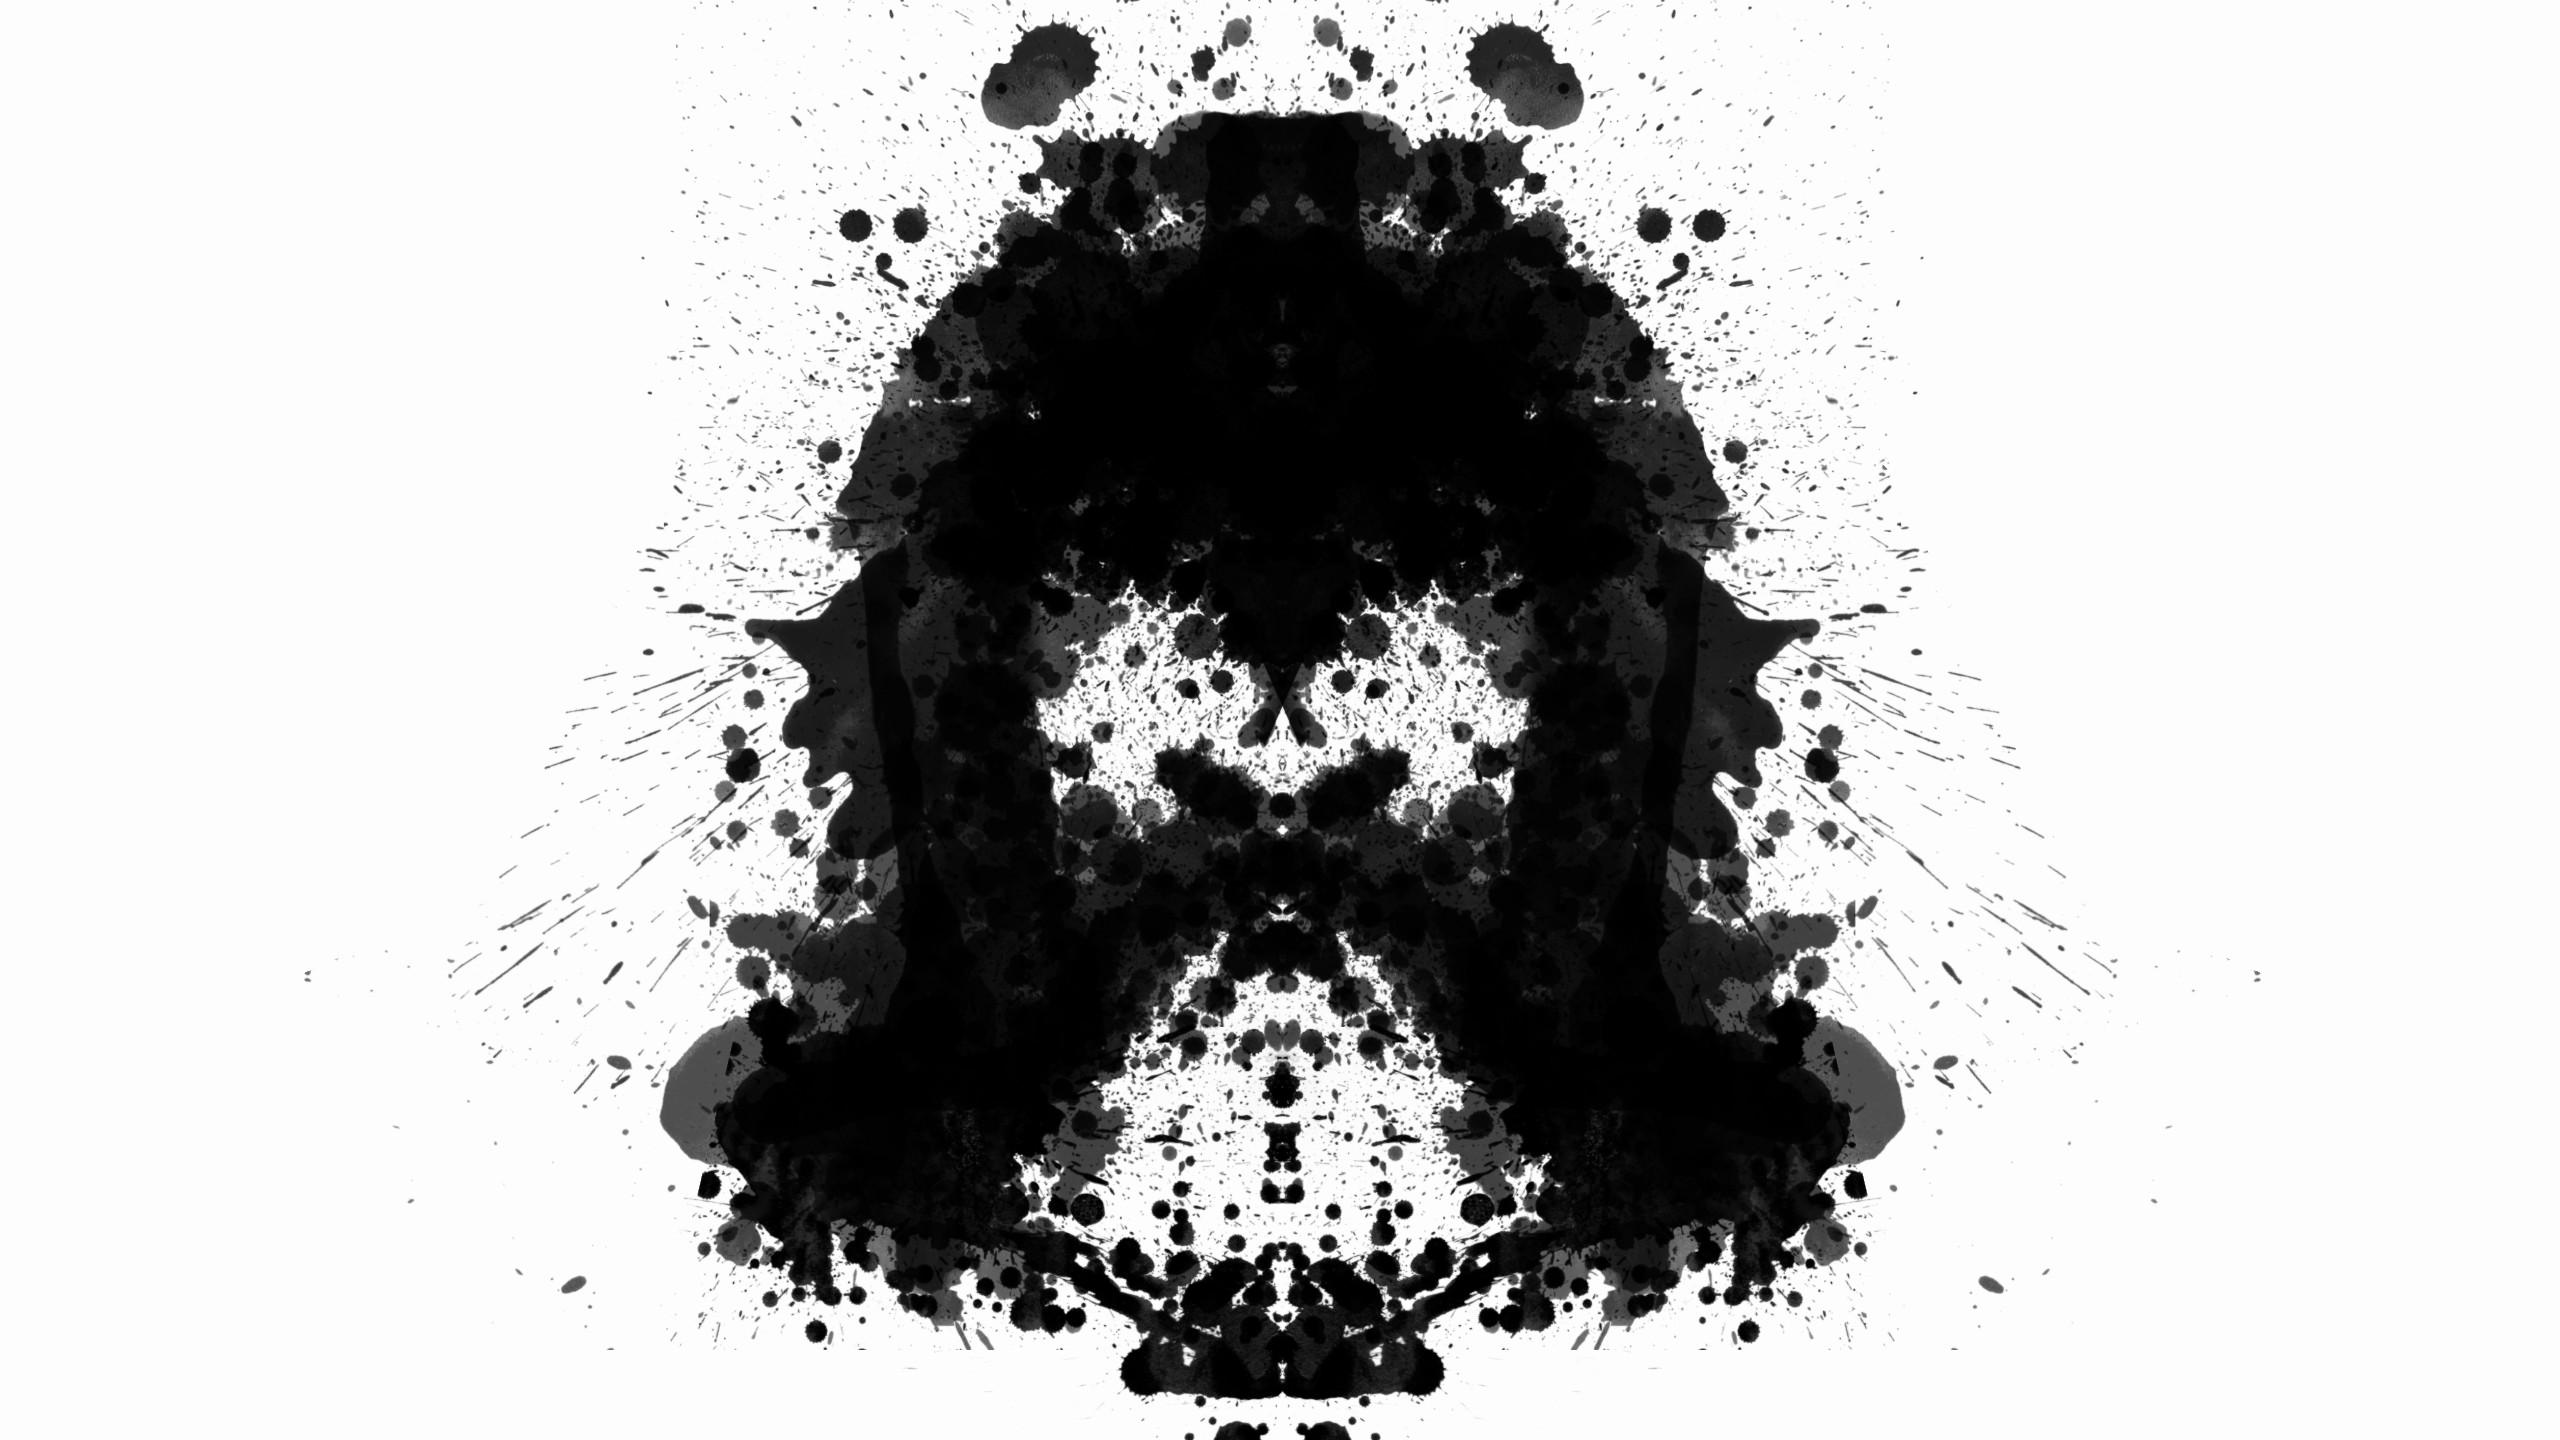 Rorschach Wallpaper 67 Pictures